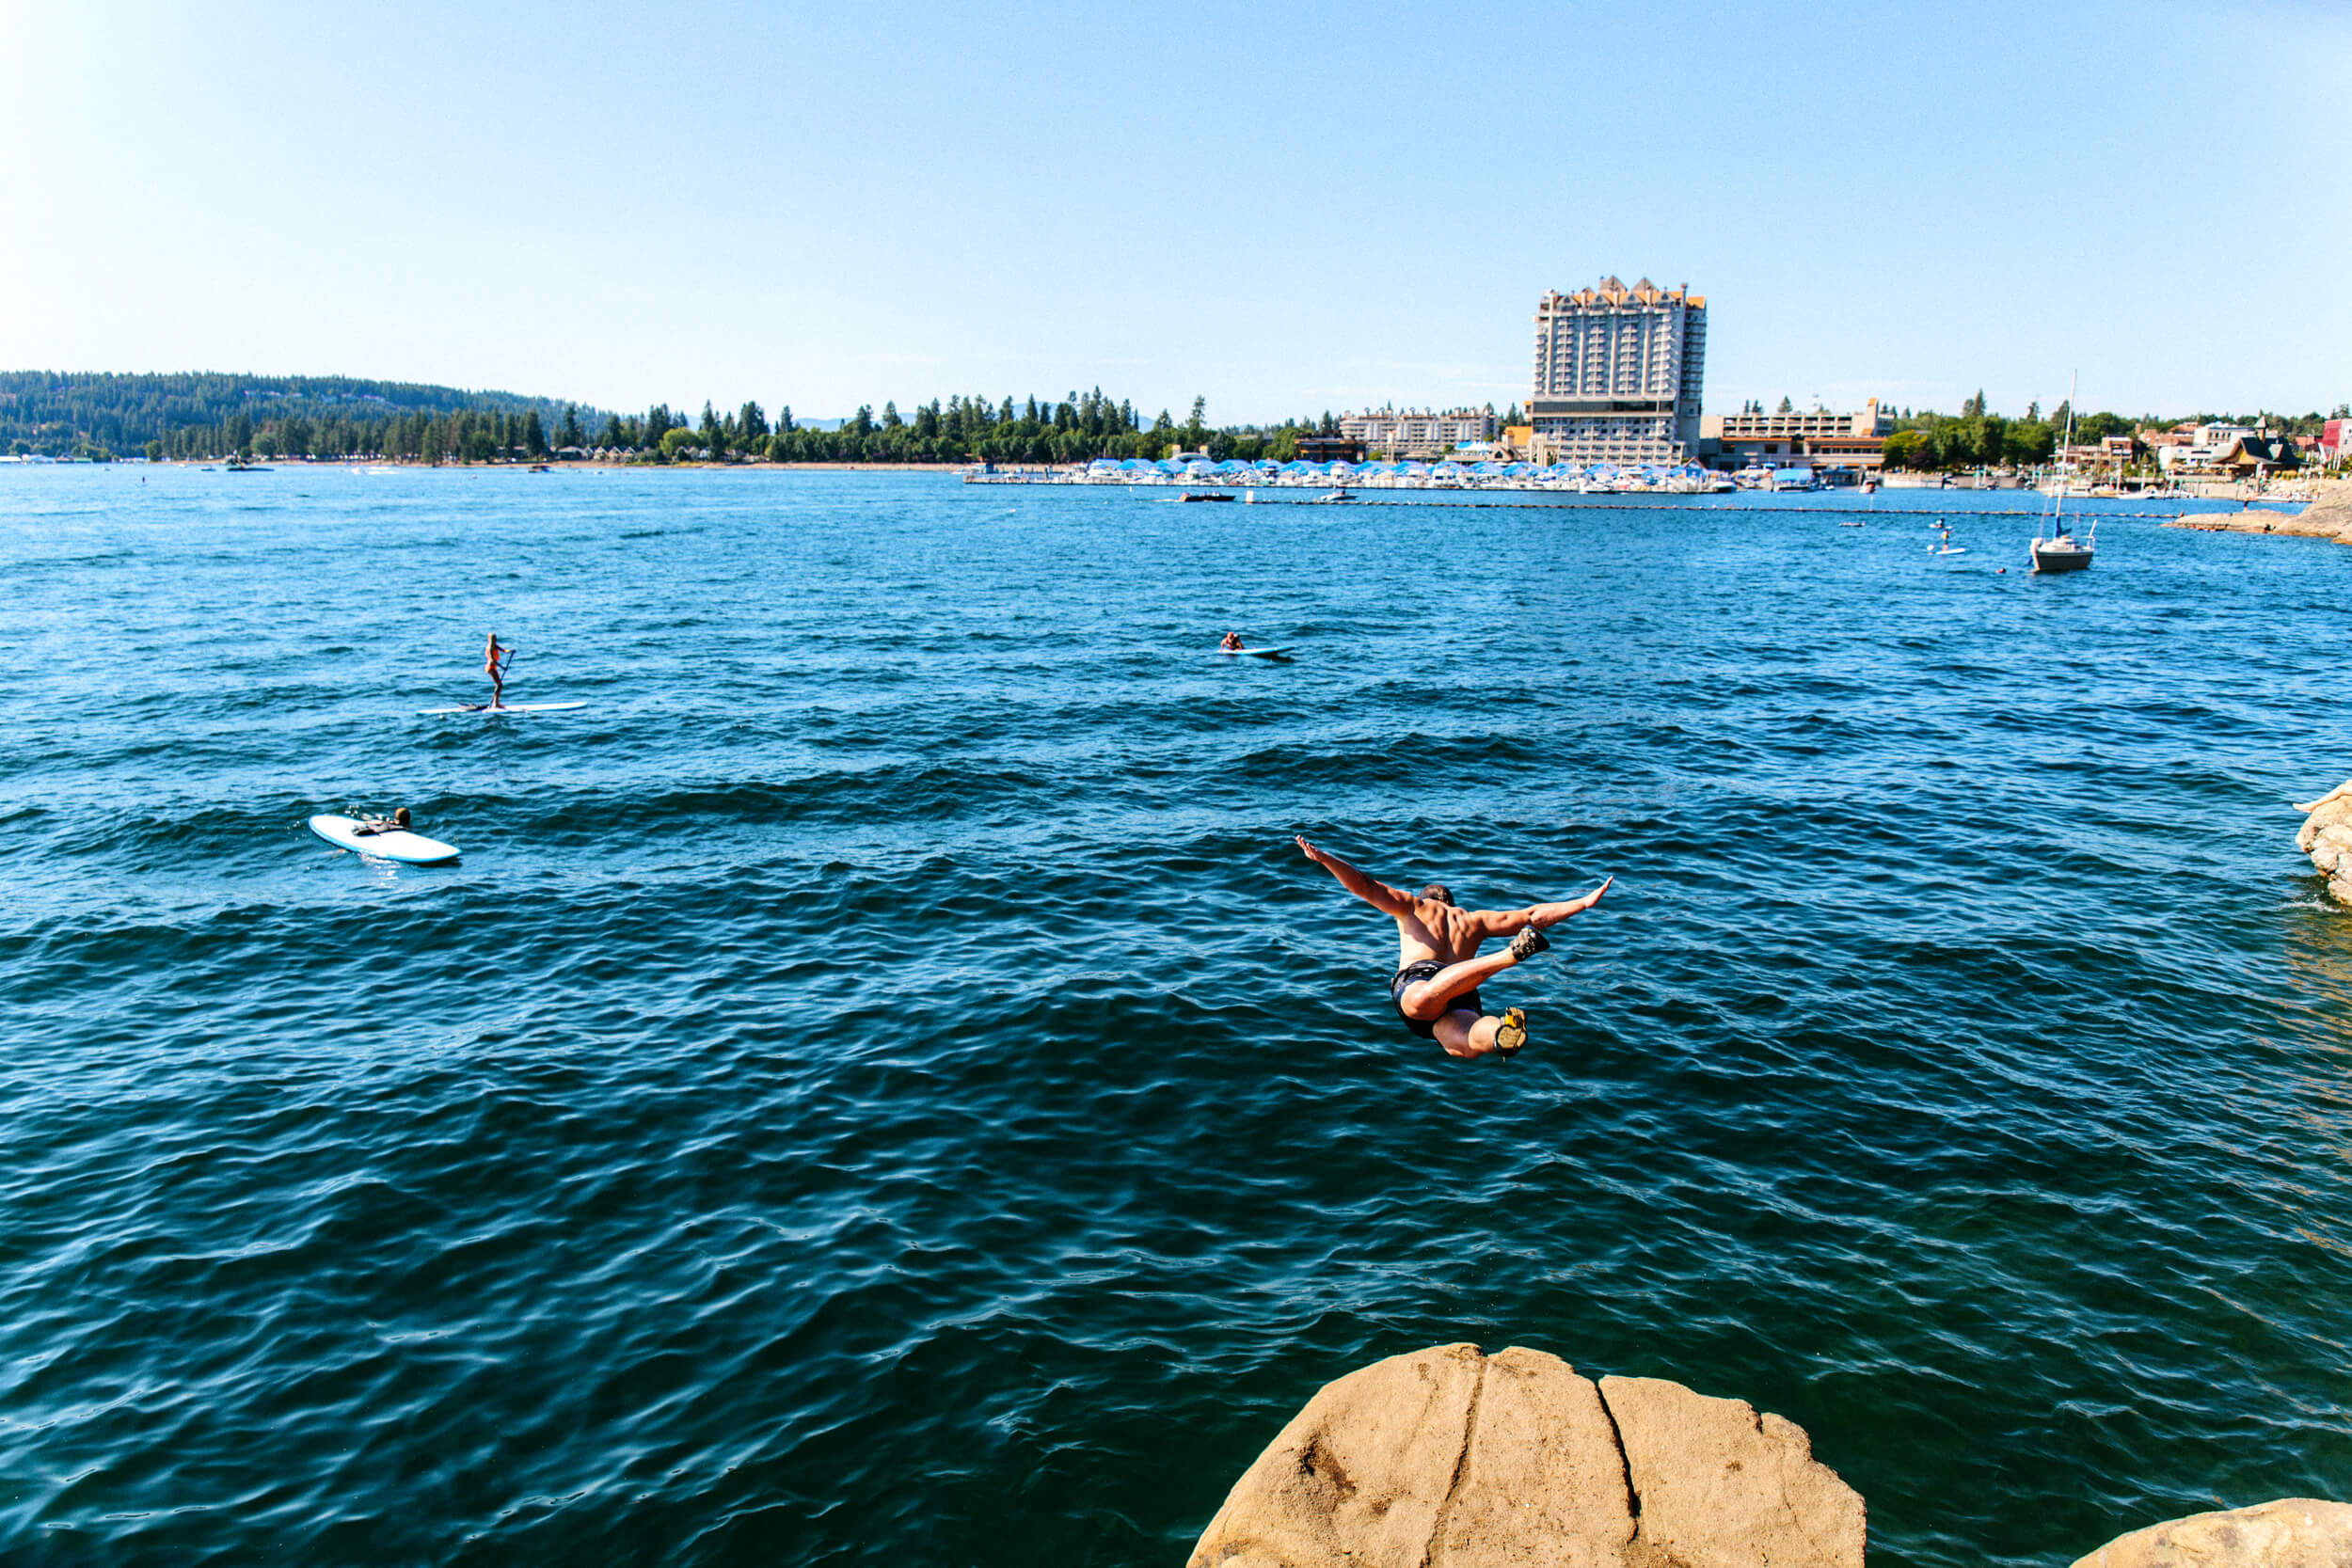 Swimming, Tubbs Hill, Near Coeur d'Alene Resort, Coeur d'Alene. Photo Credit: Idaho Tourism